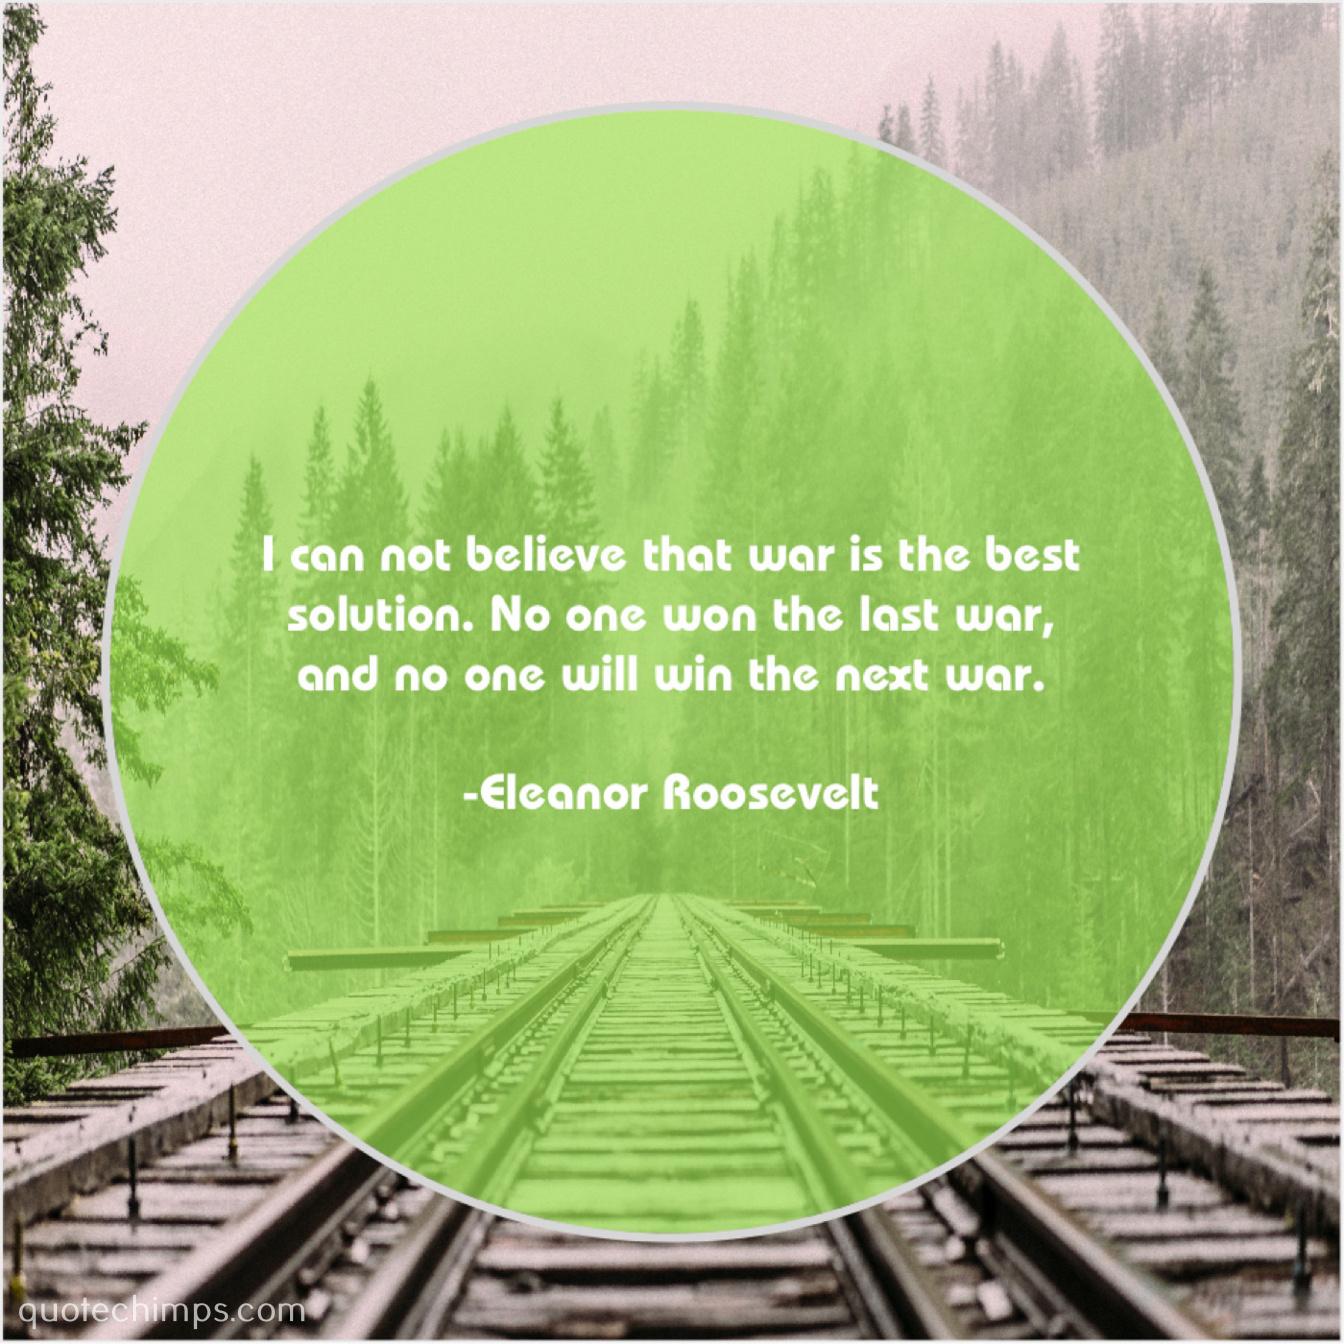 Eleanor Roosevelt | | Quote Chimps